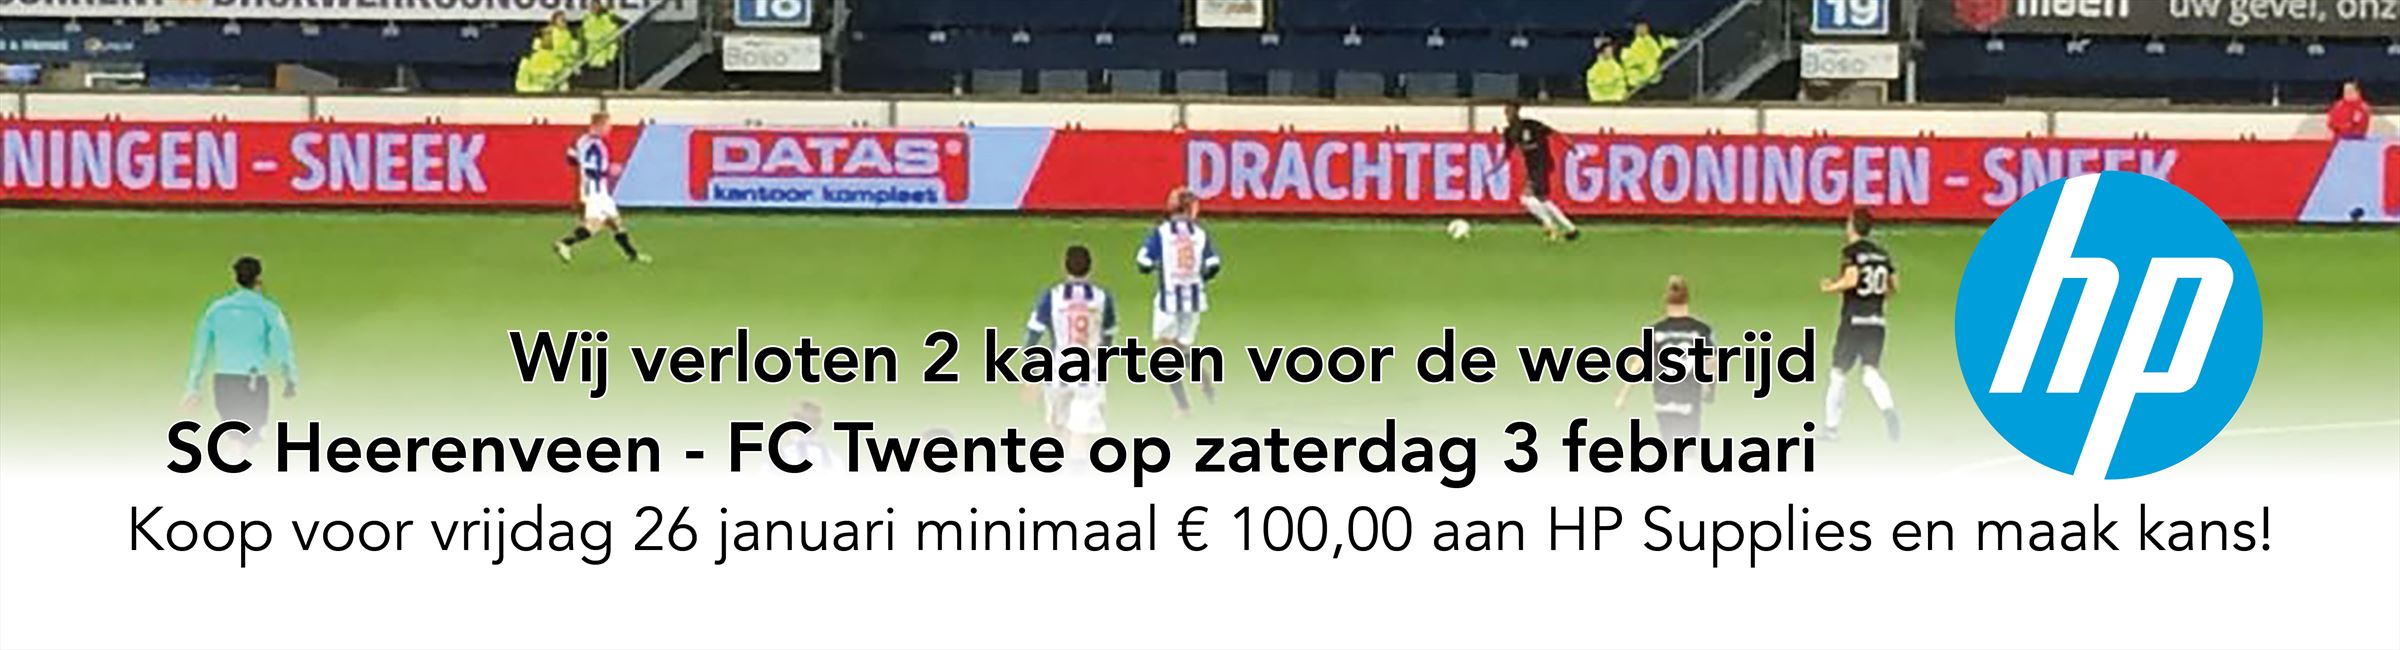 Datas Voetbal Actie